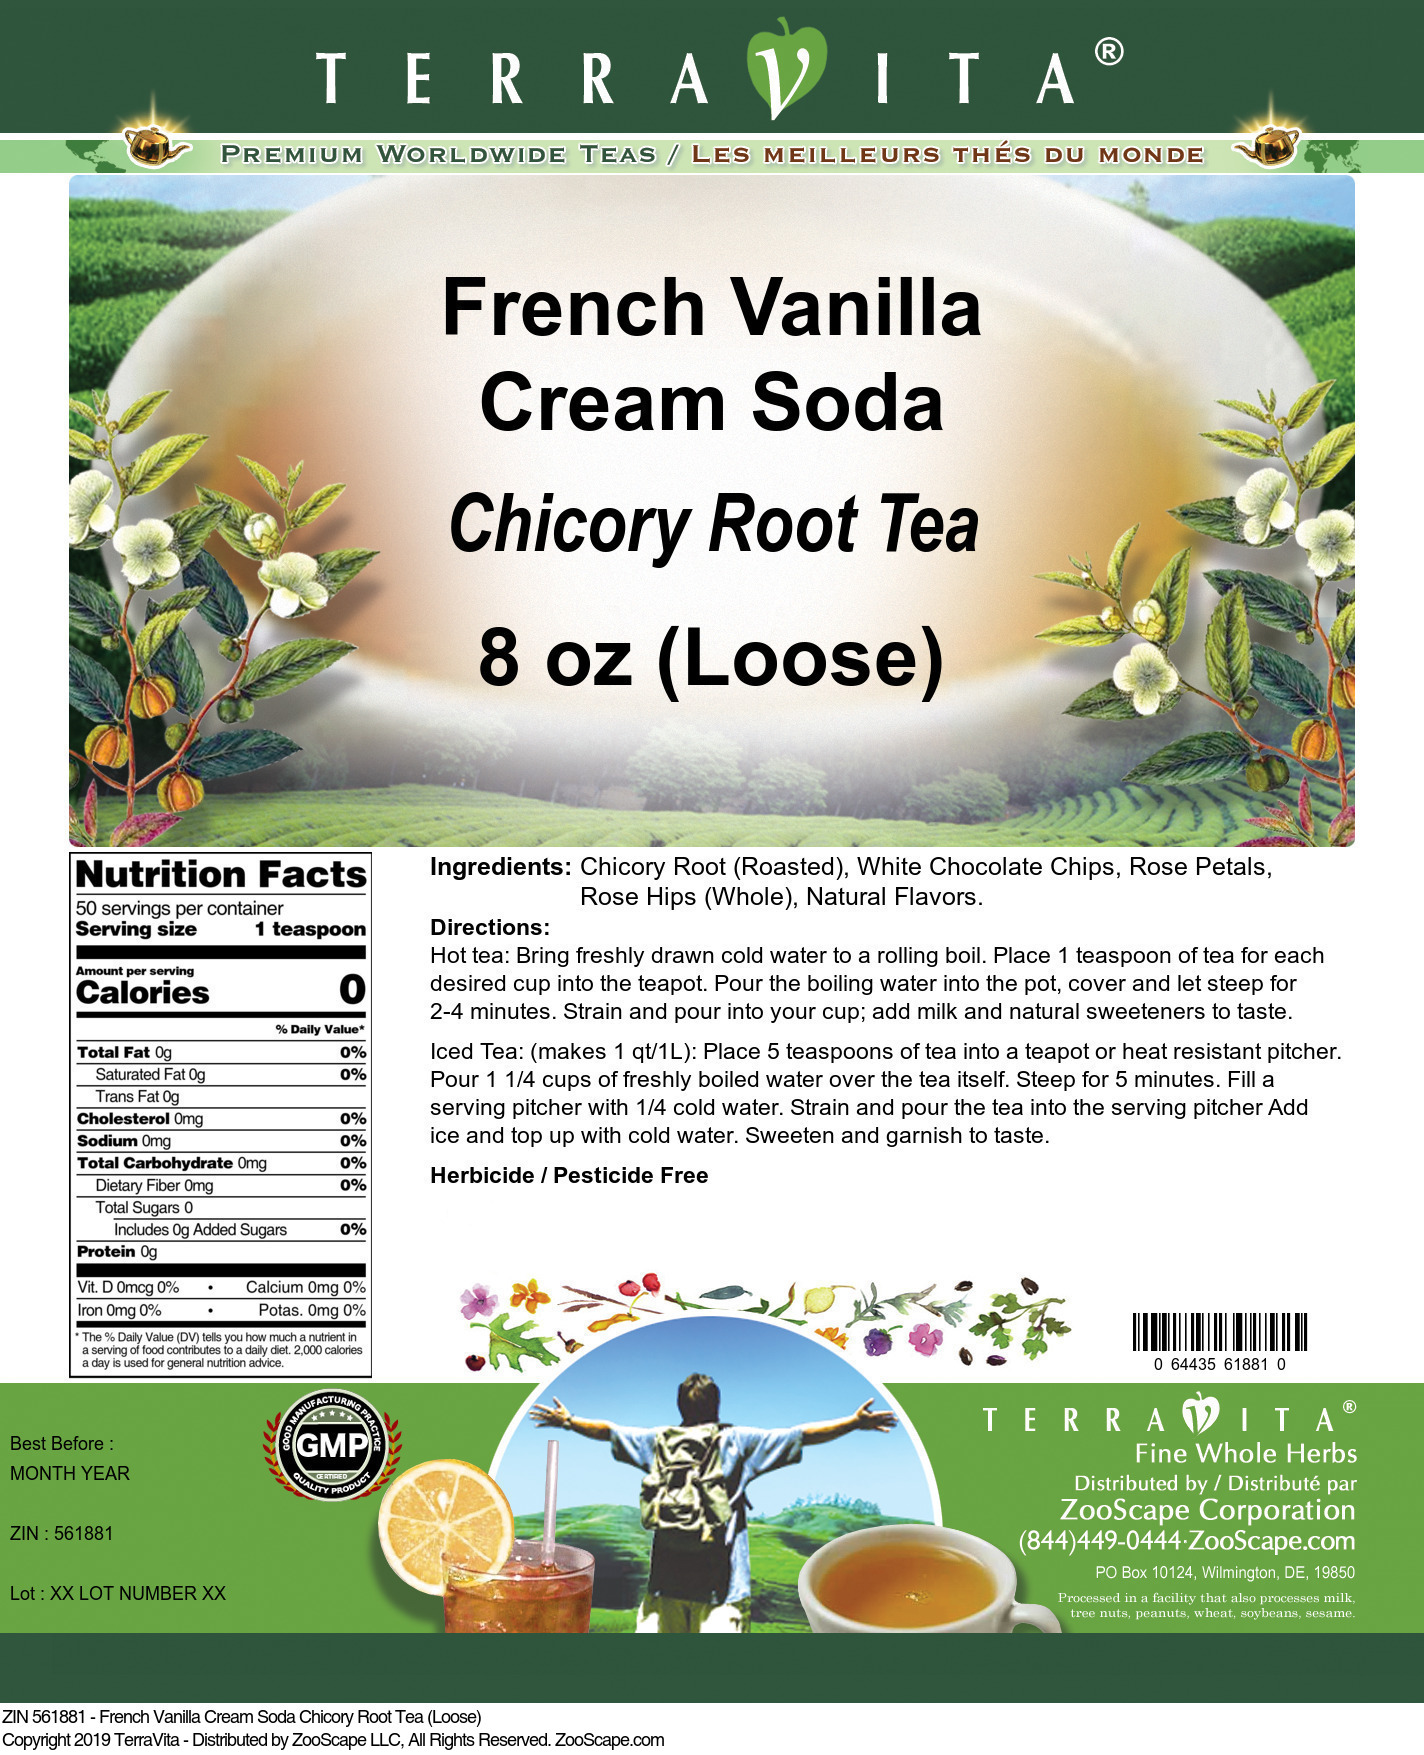 French Vanilla Cream Soda Chicory Root Tea (Loose)